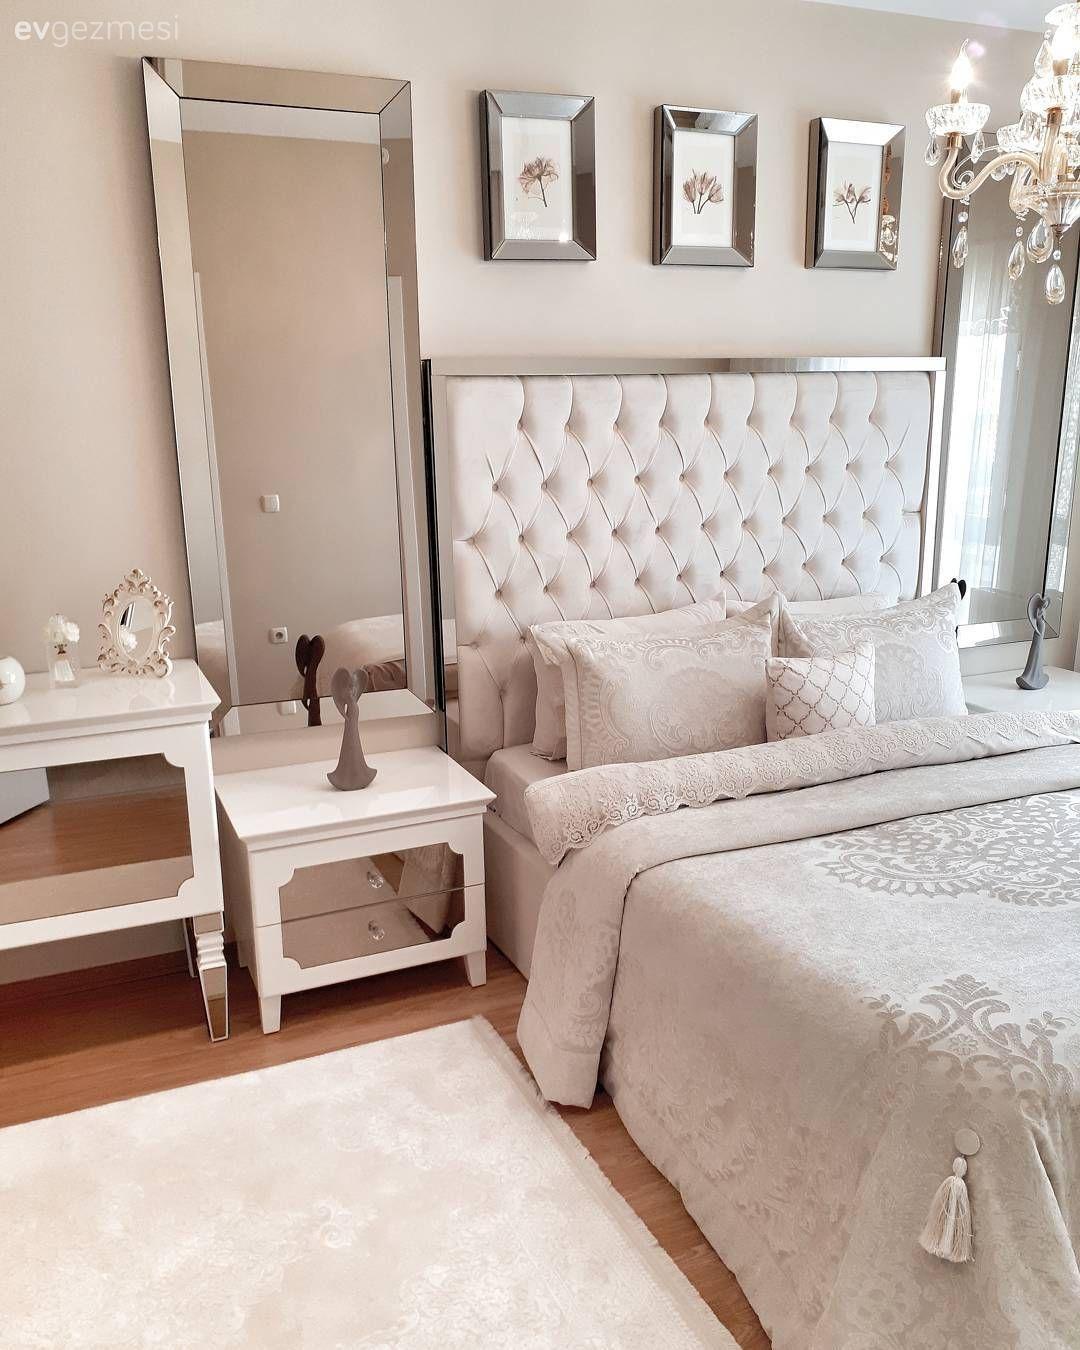 Acik Renkler Ile Hafif Aynalar Ile Goz Alici Keyifli Ve Sik Bir Ev Ev Gezmesi In 2020 Mirrored Furniture White Carpet Bedroom White Carpet